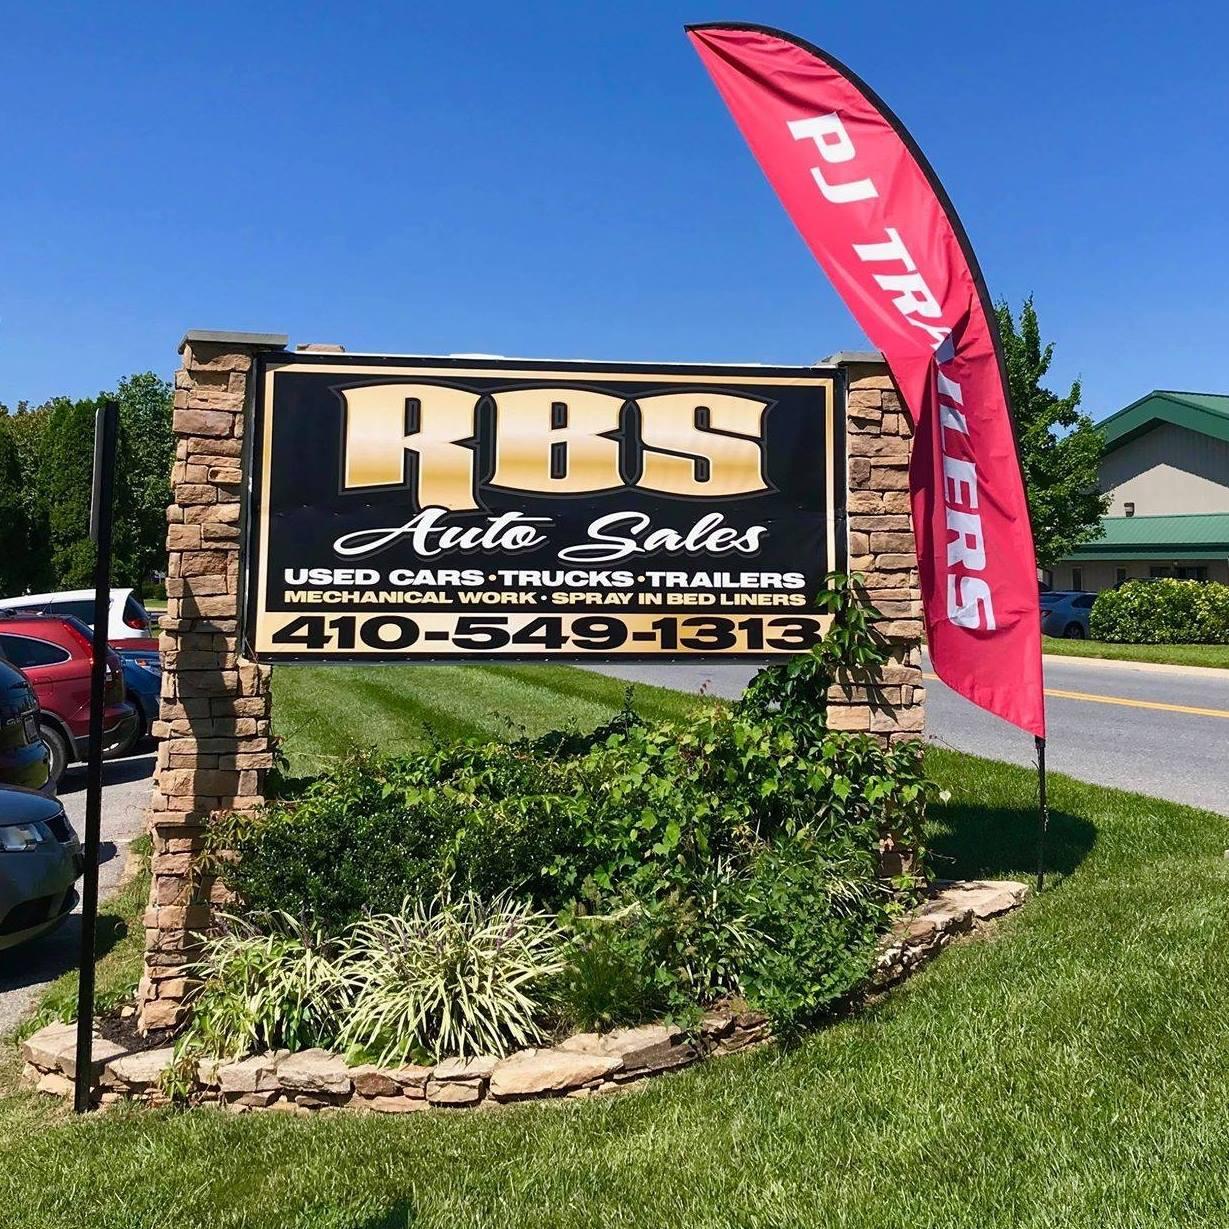 RBS Auto Sales